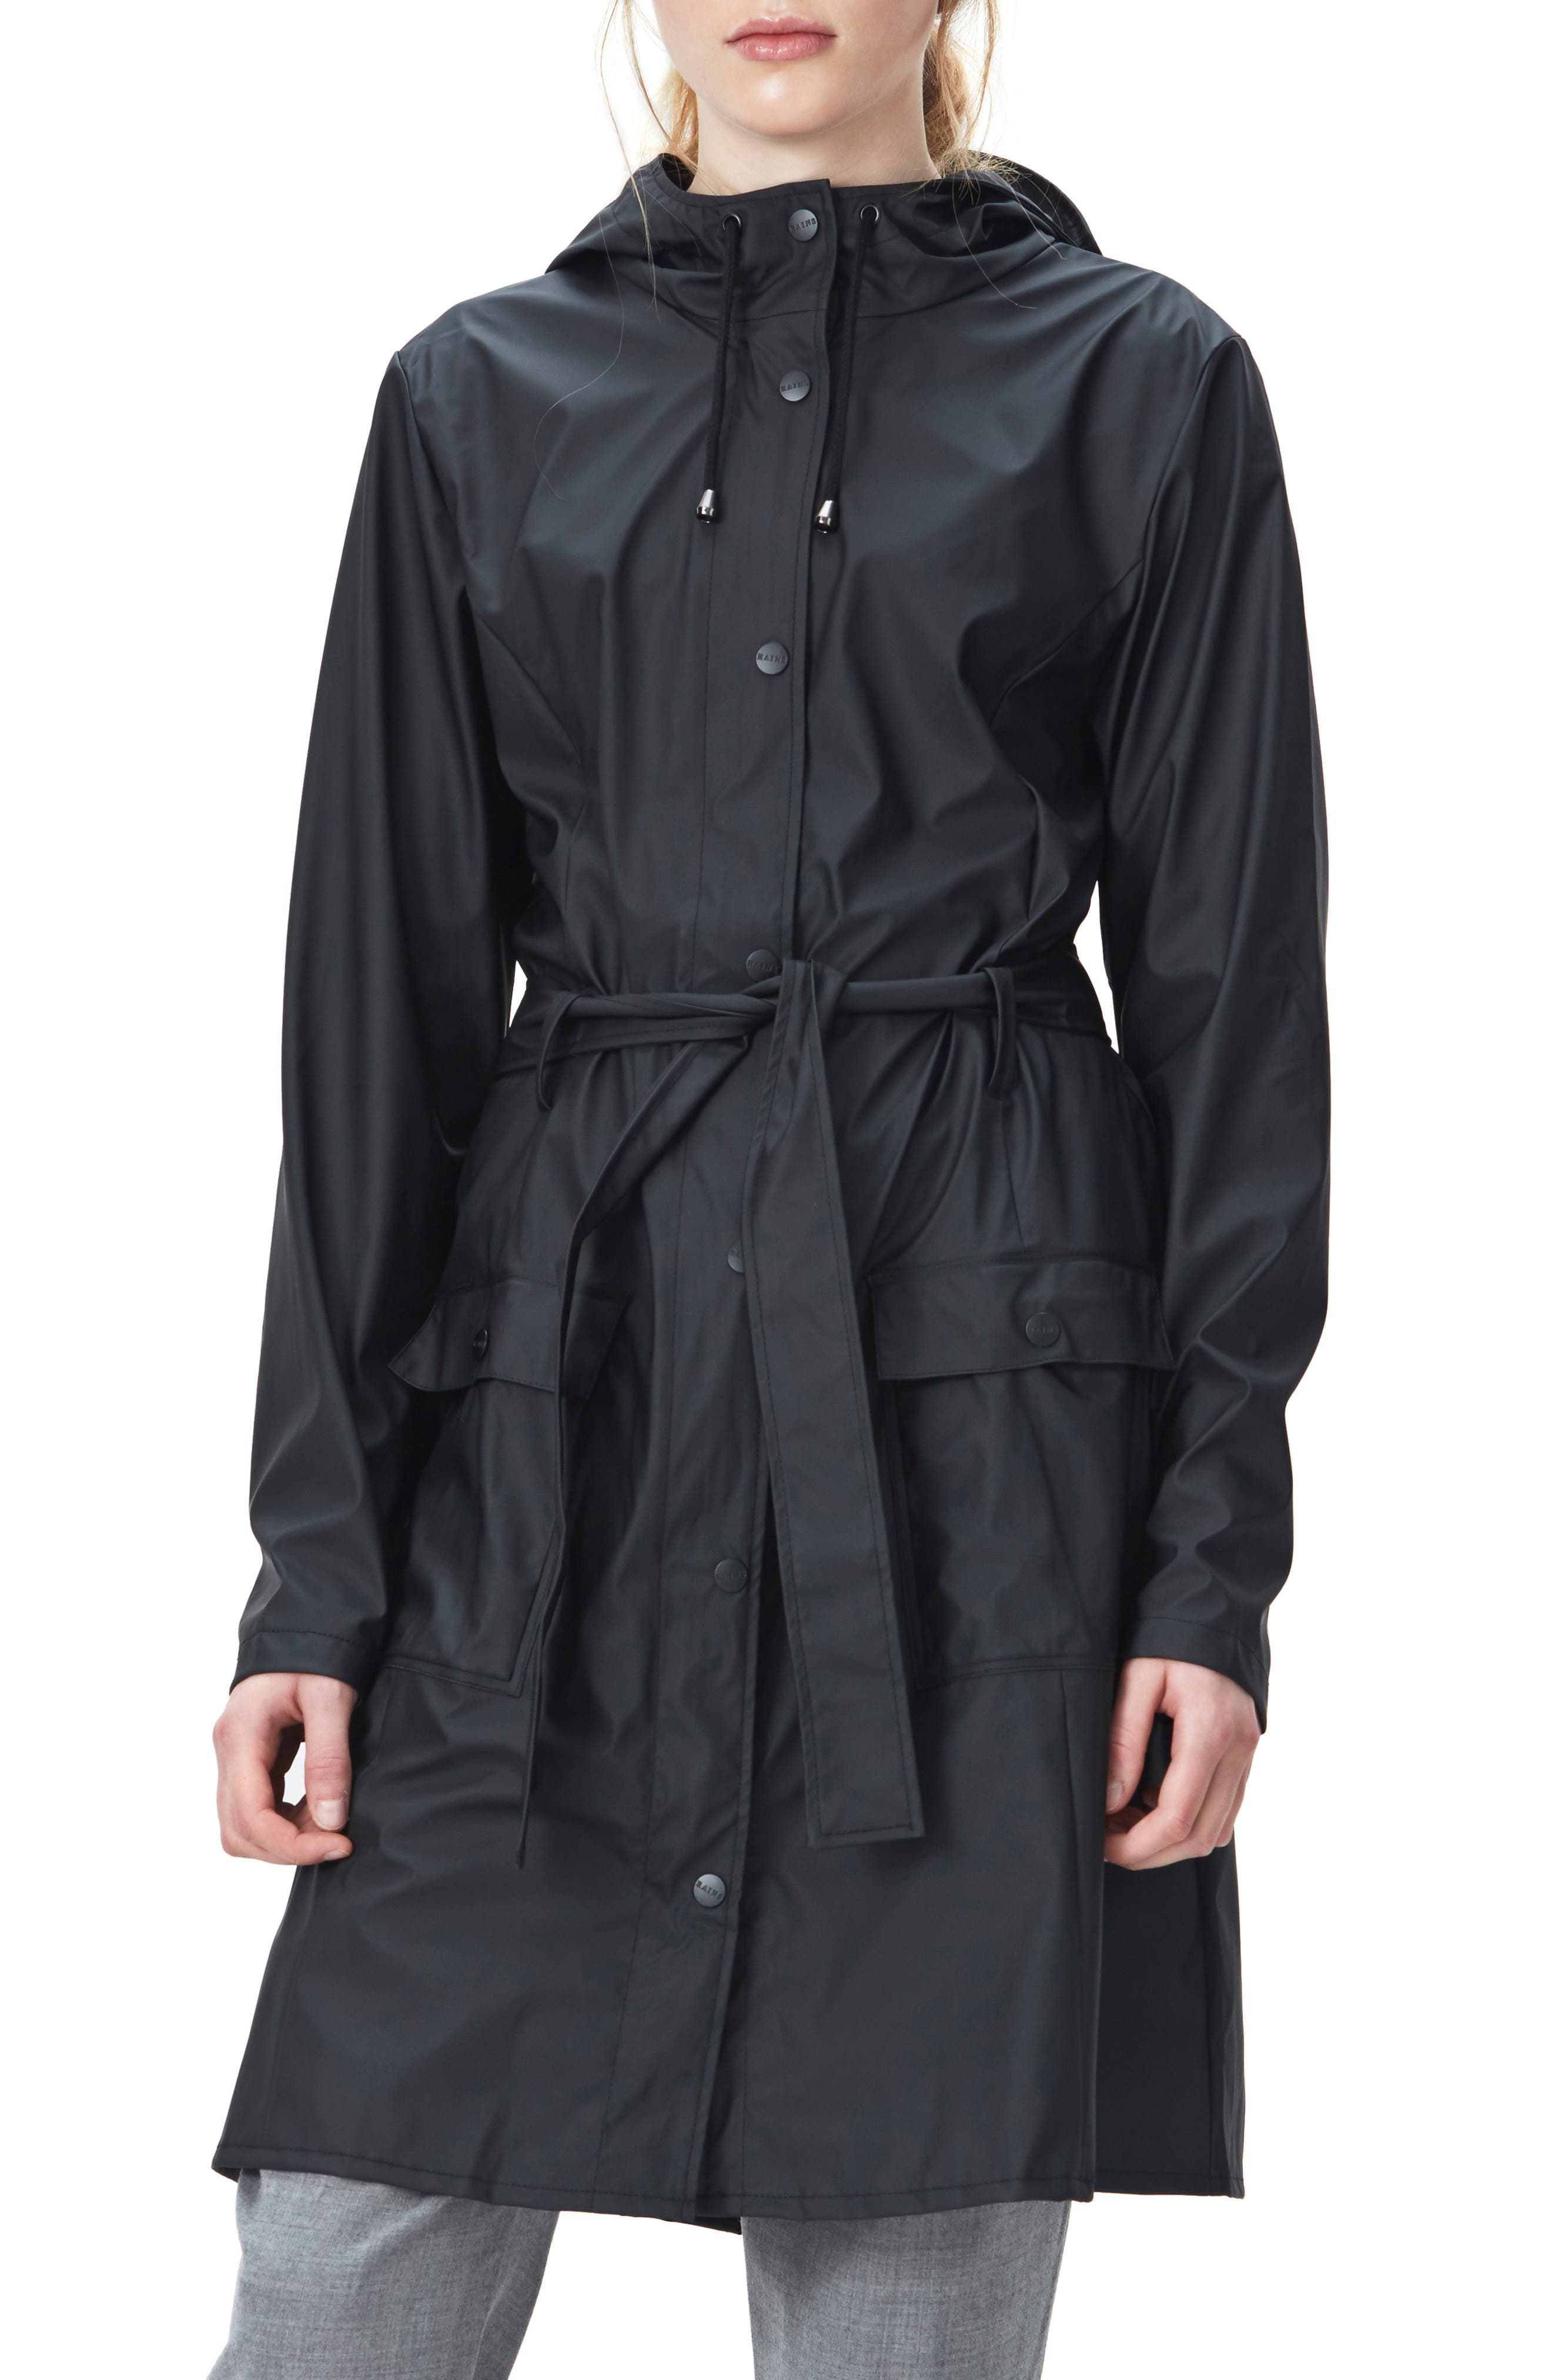 Curve Waterproof Hooded Rain Jacket,                             Main thumbnail 1, color,                             BLACK